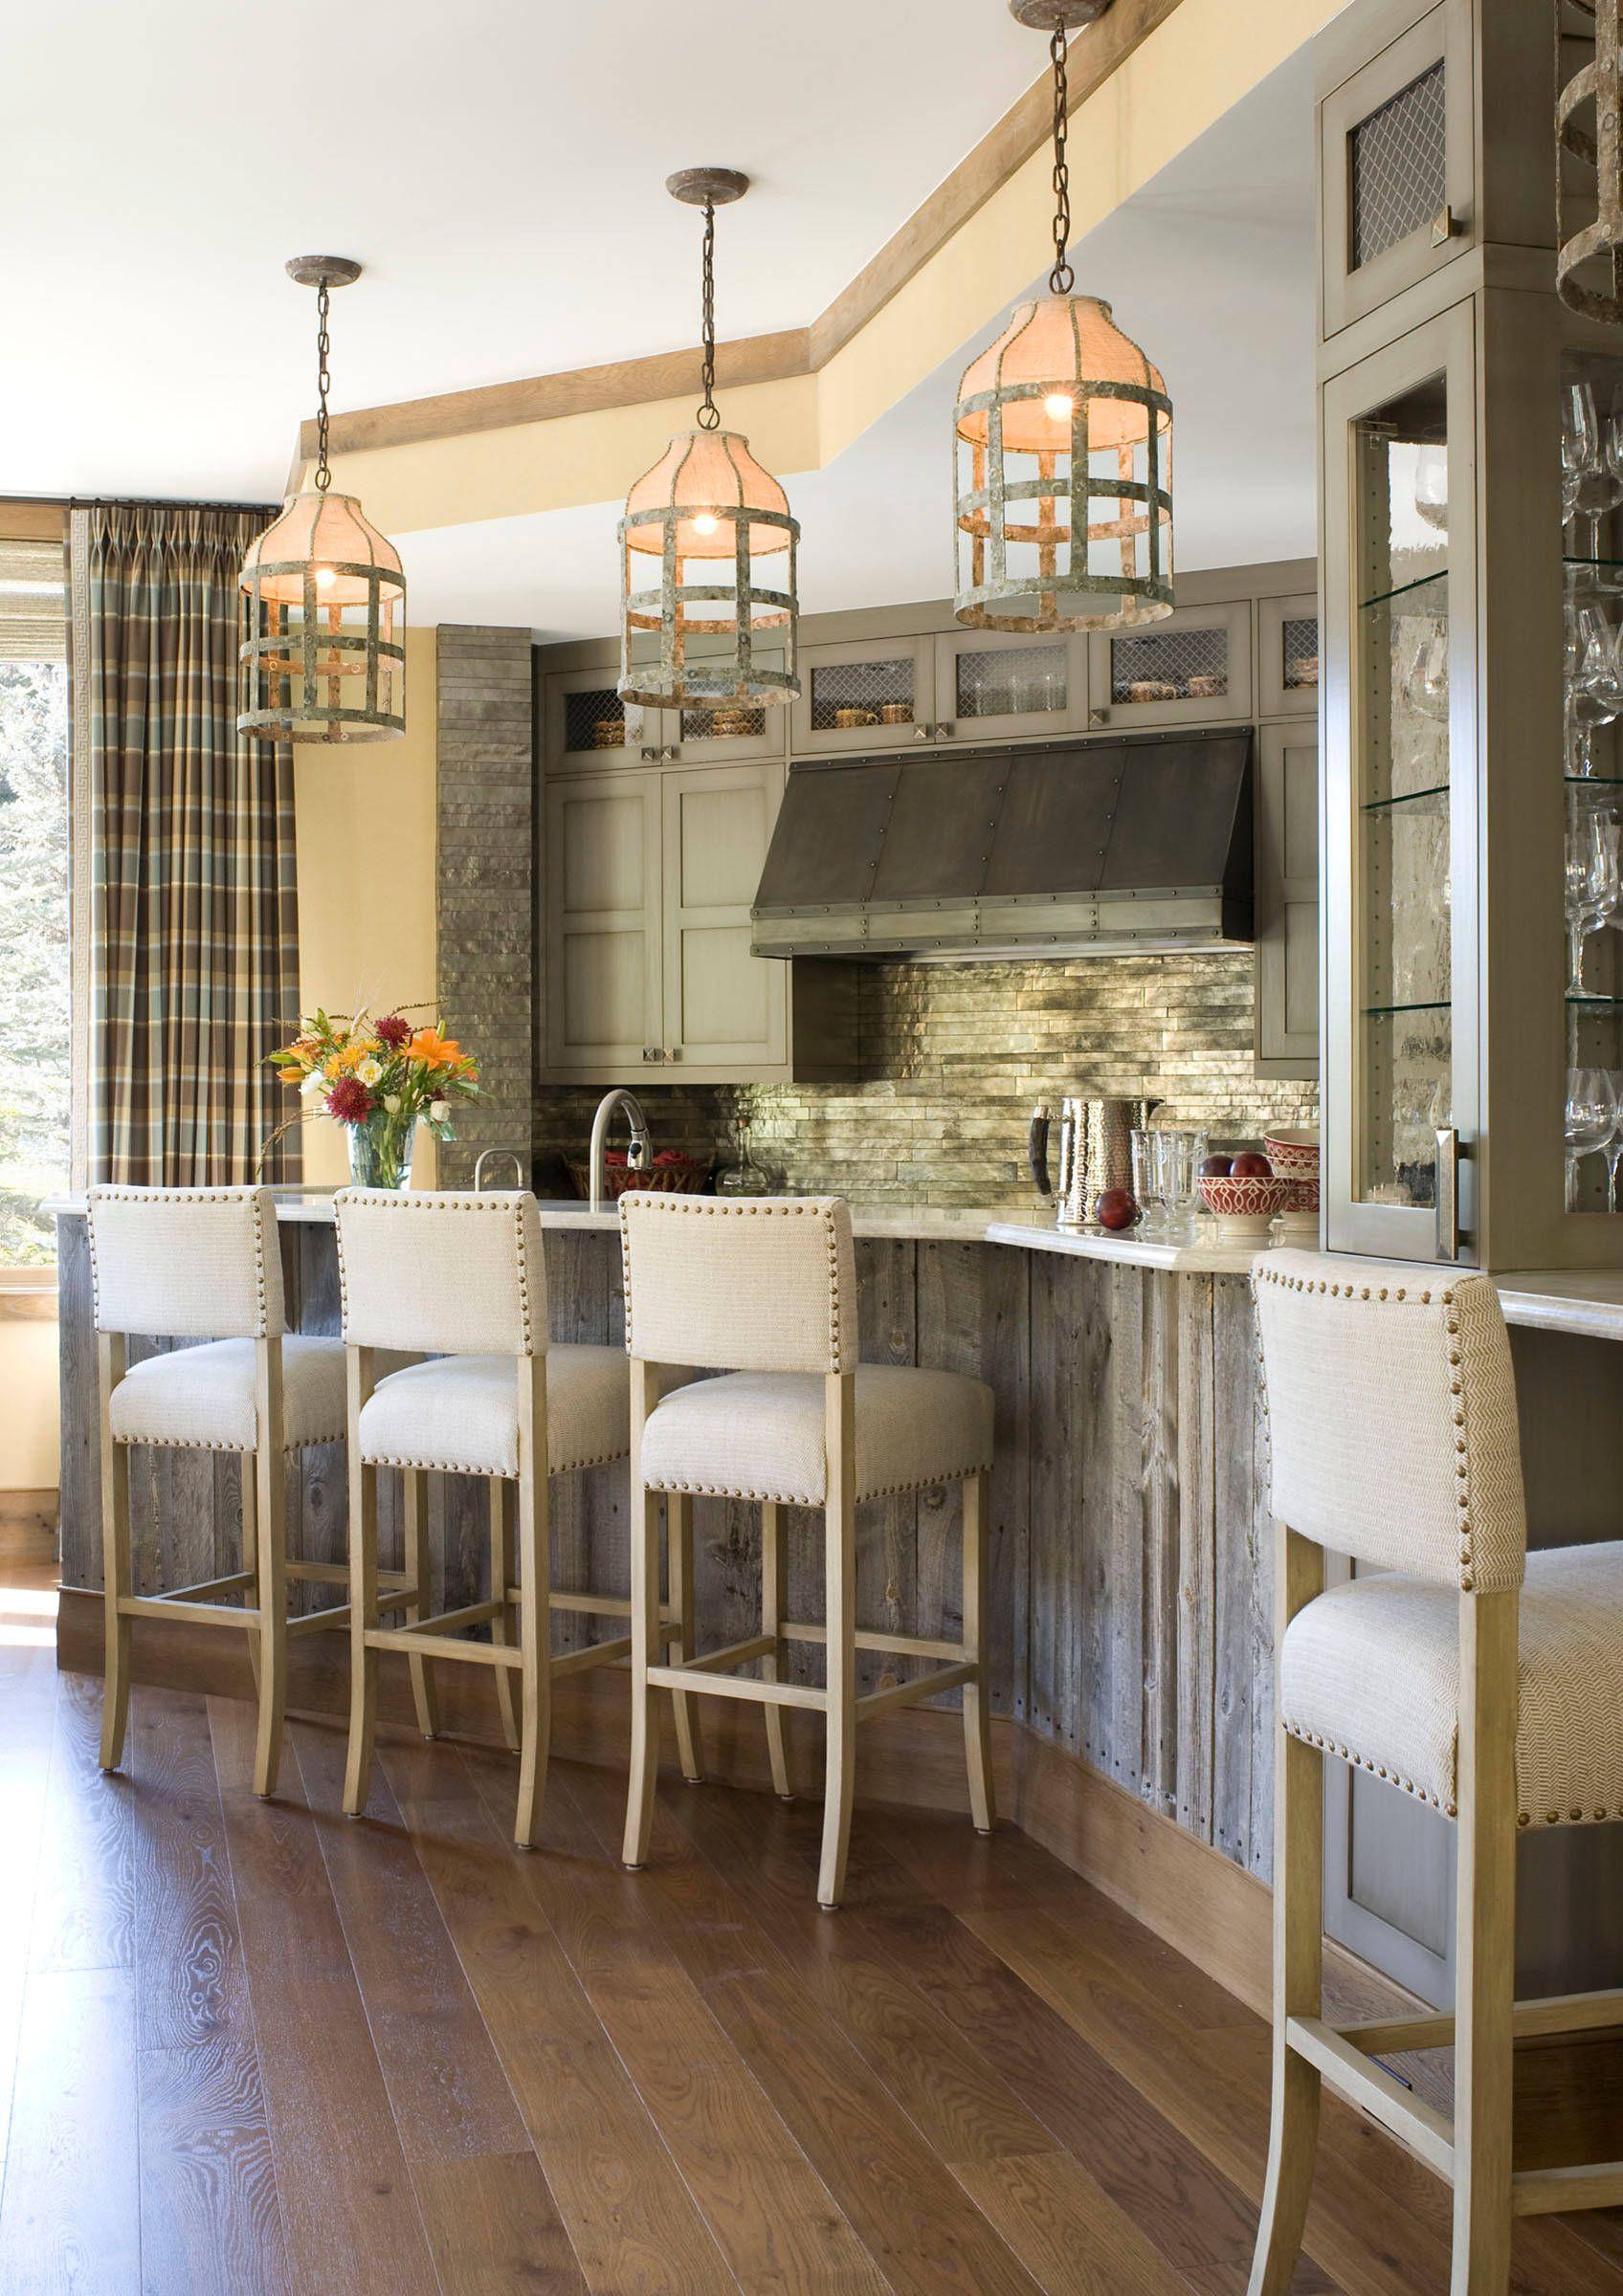 restoration hardware kitchen stools> OFF 9